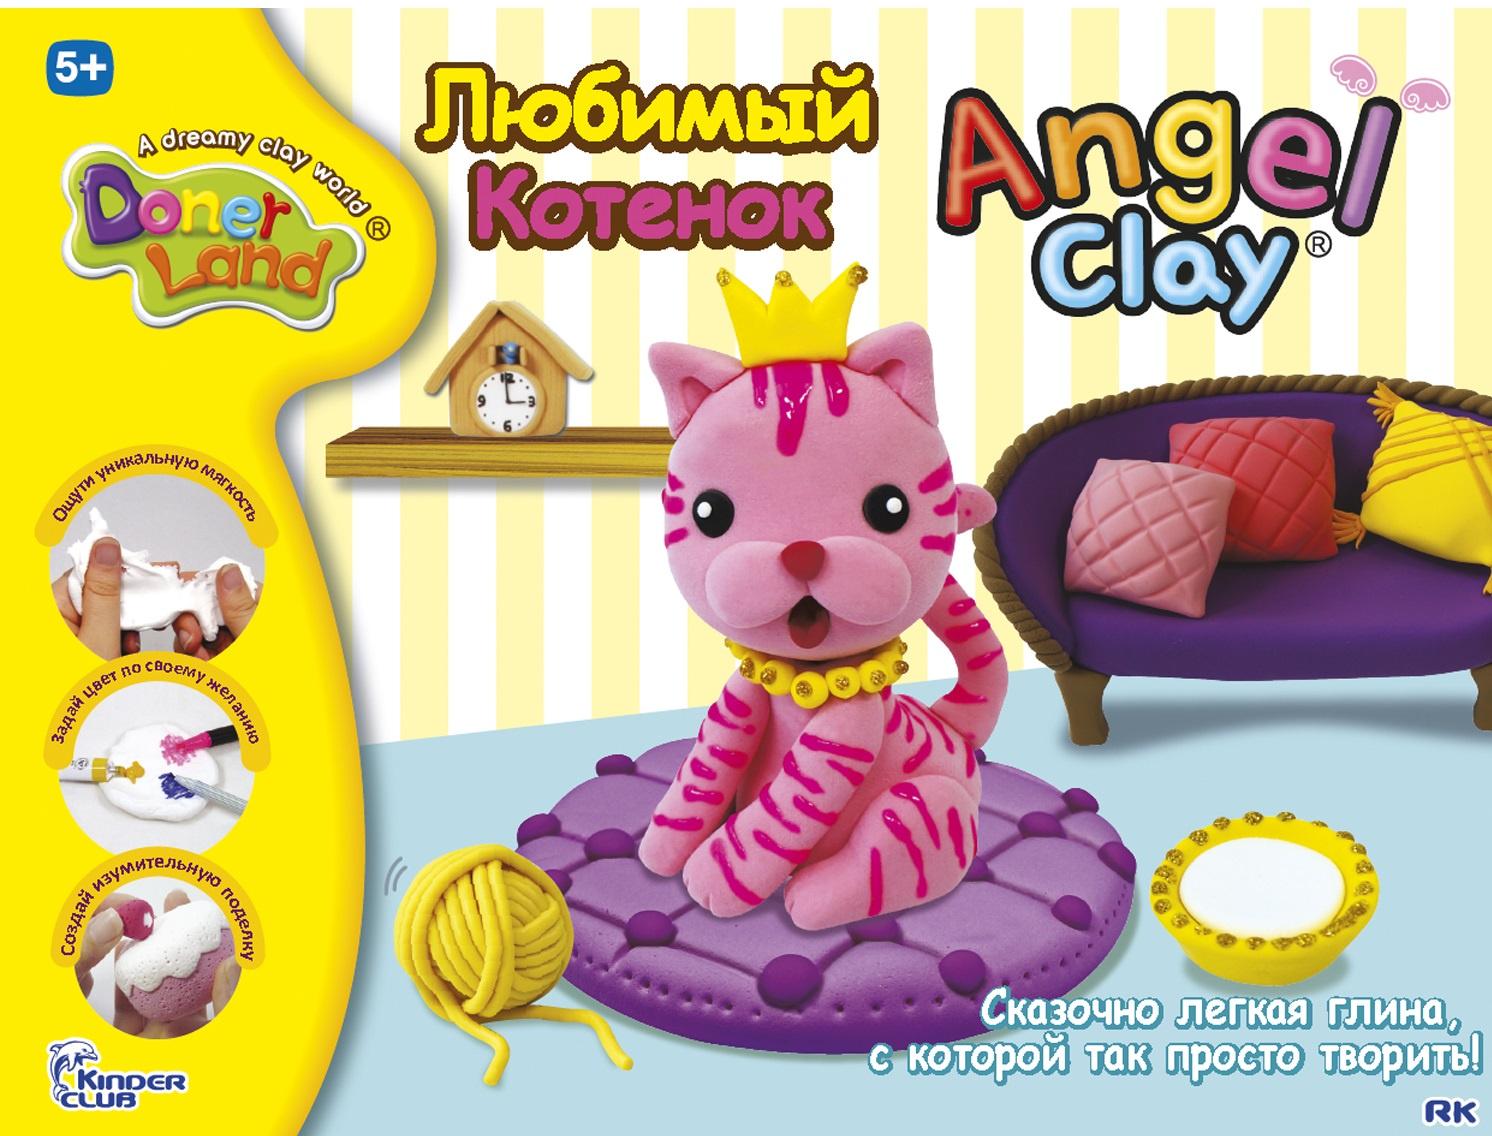 наборы для лепки angel clay набор для лепки angel clay шоколадная мастерская на русском языке Масса для лепки Angel Clay Кошечка (Lovely My Cat)